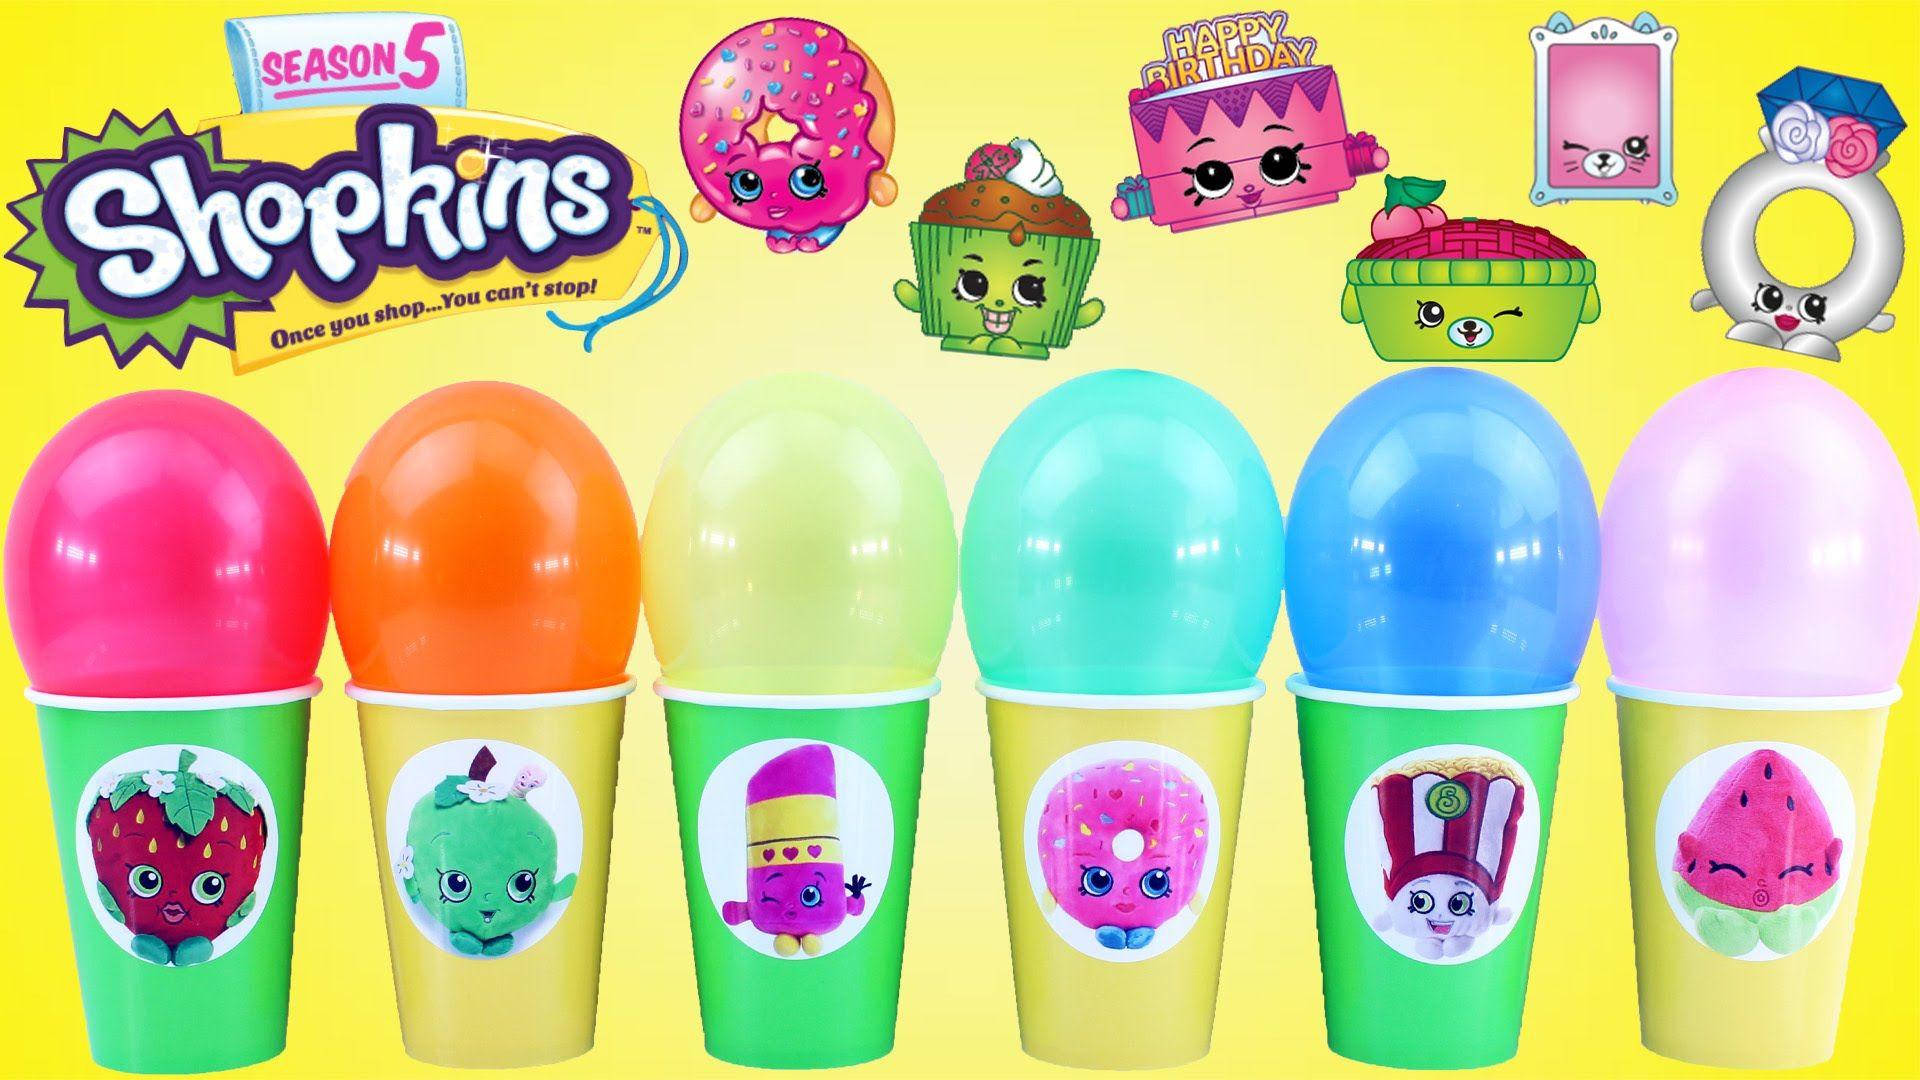 Shopkins Surprise Toy Balloon Cups Blind Bags Season